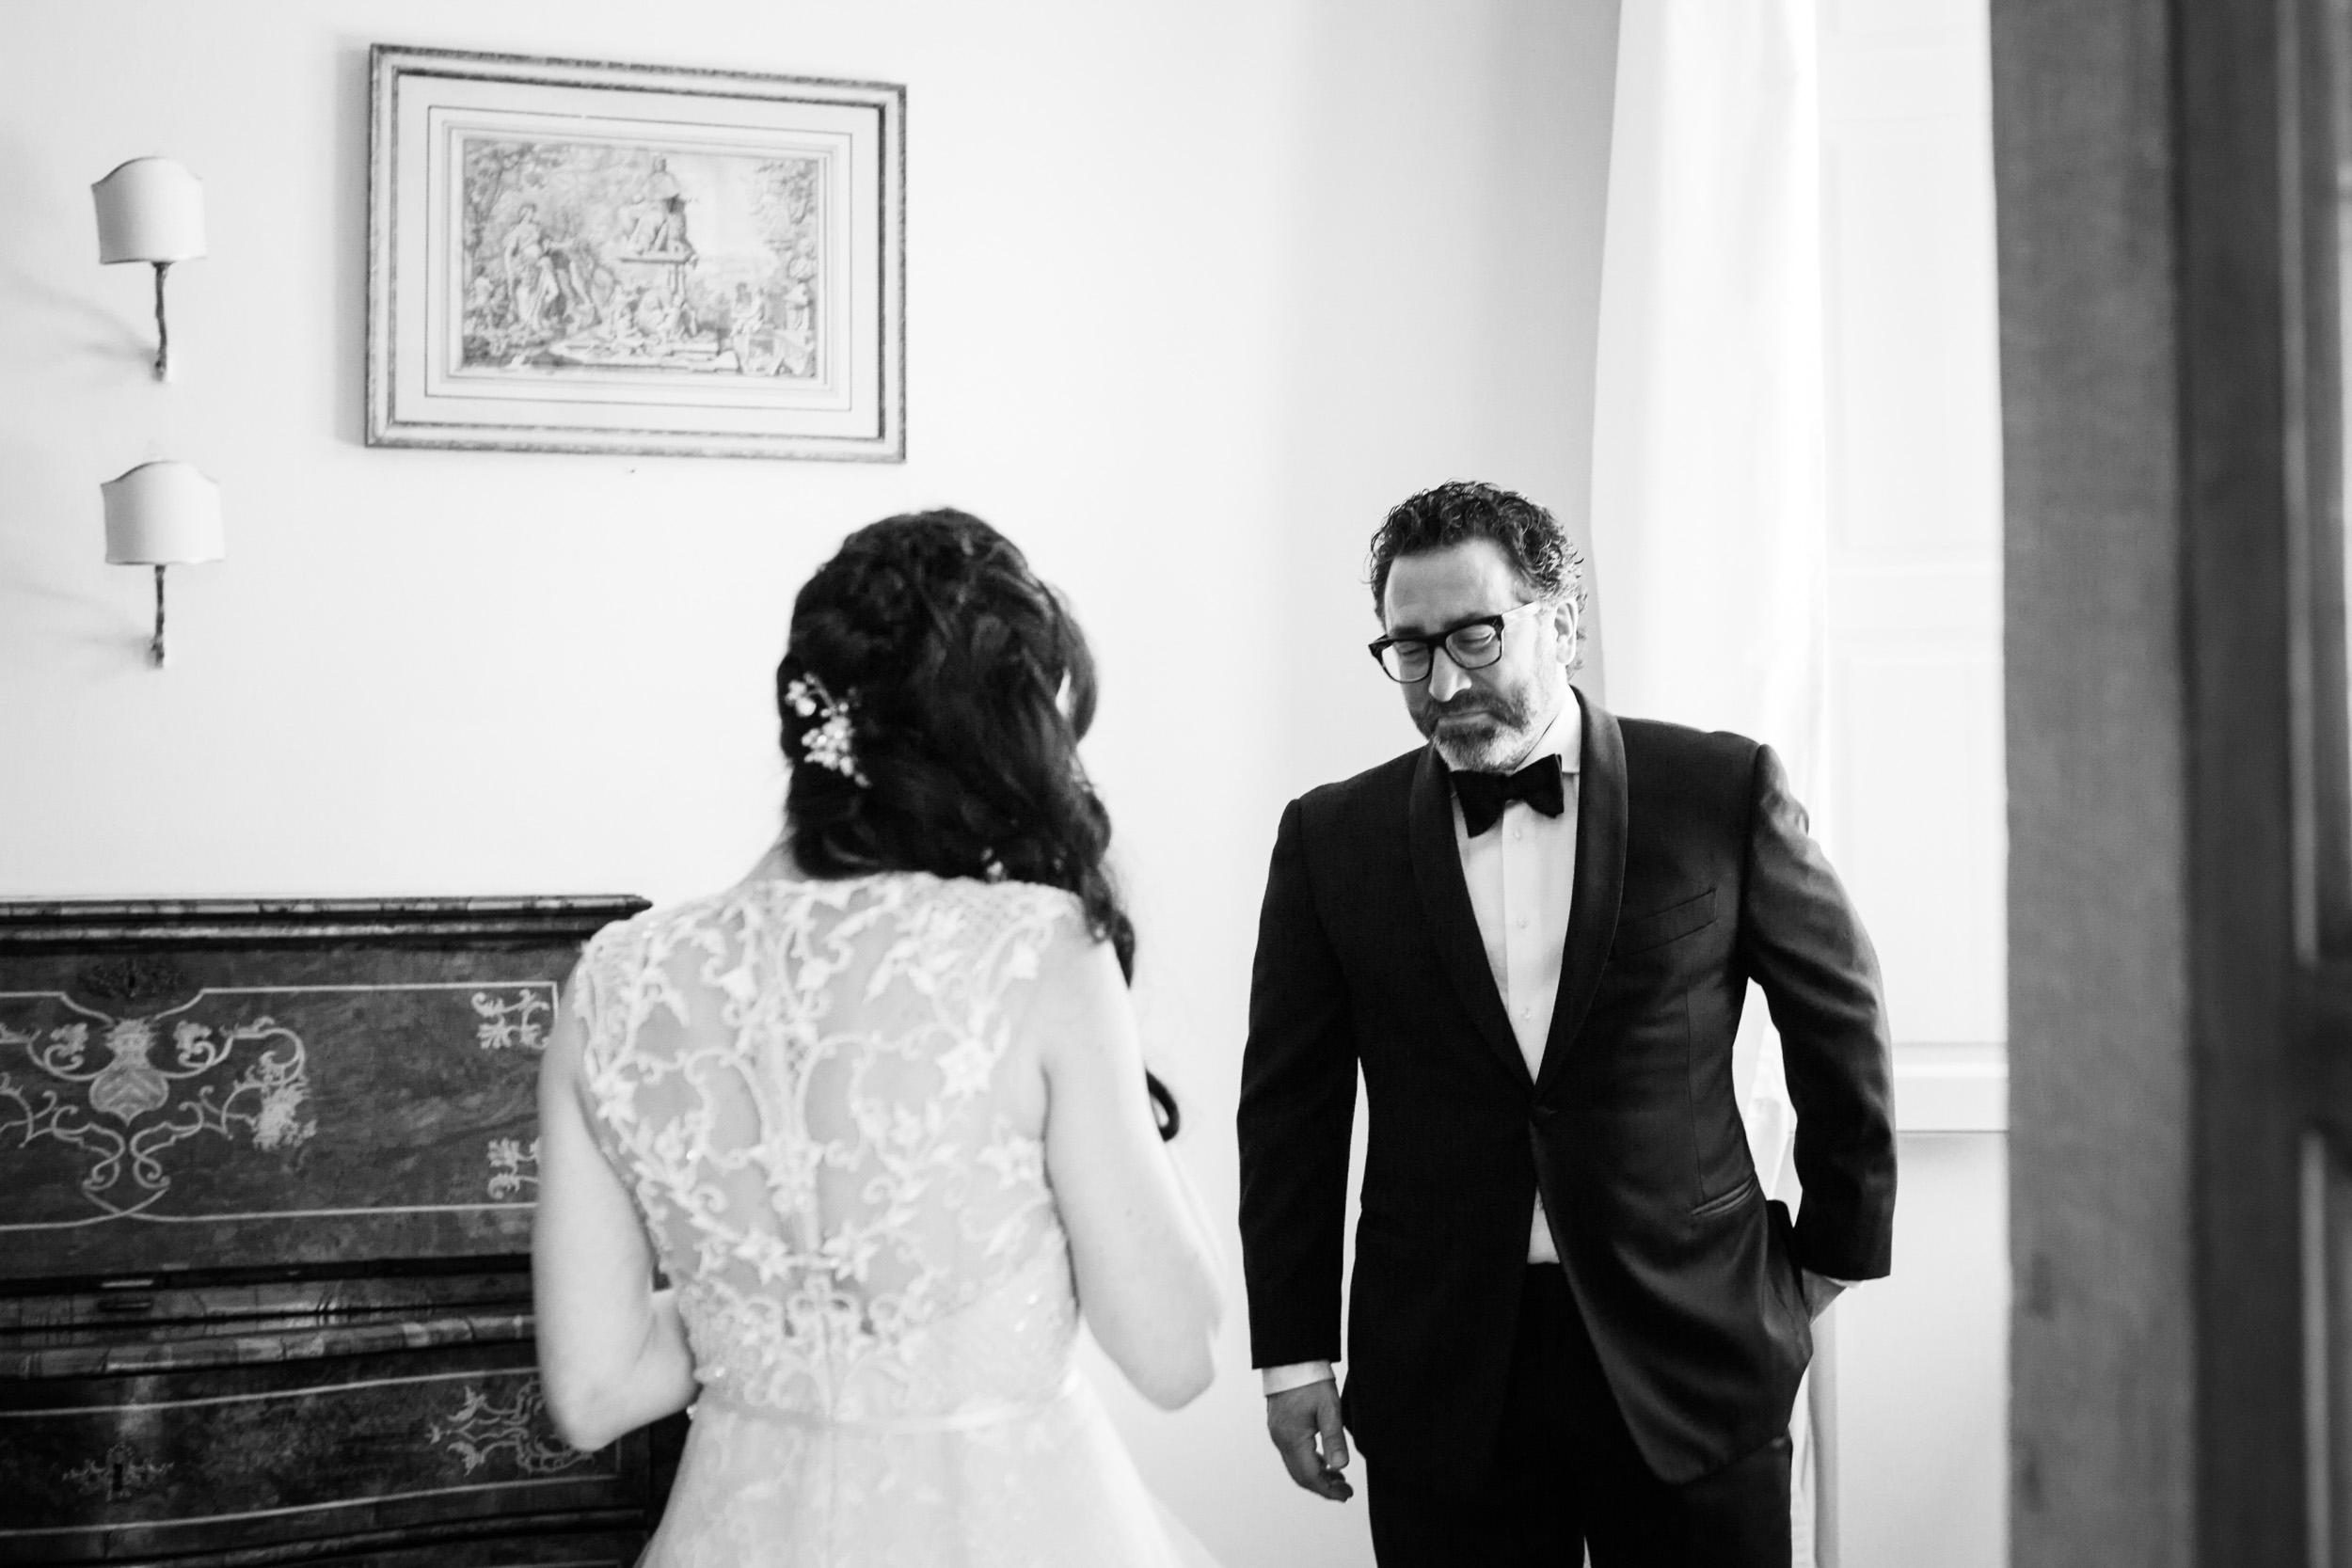 villa-gamberaia-florence-italy-destination-wedding-15.jpg